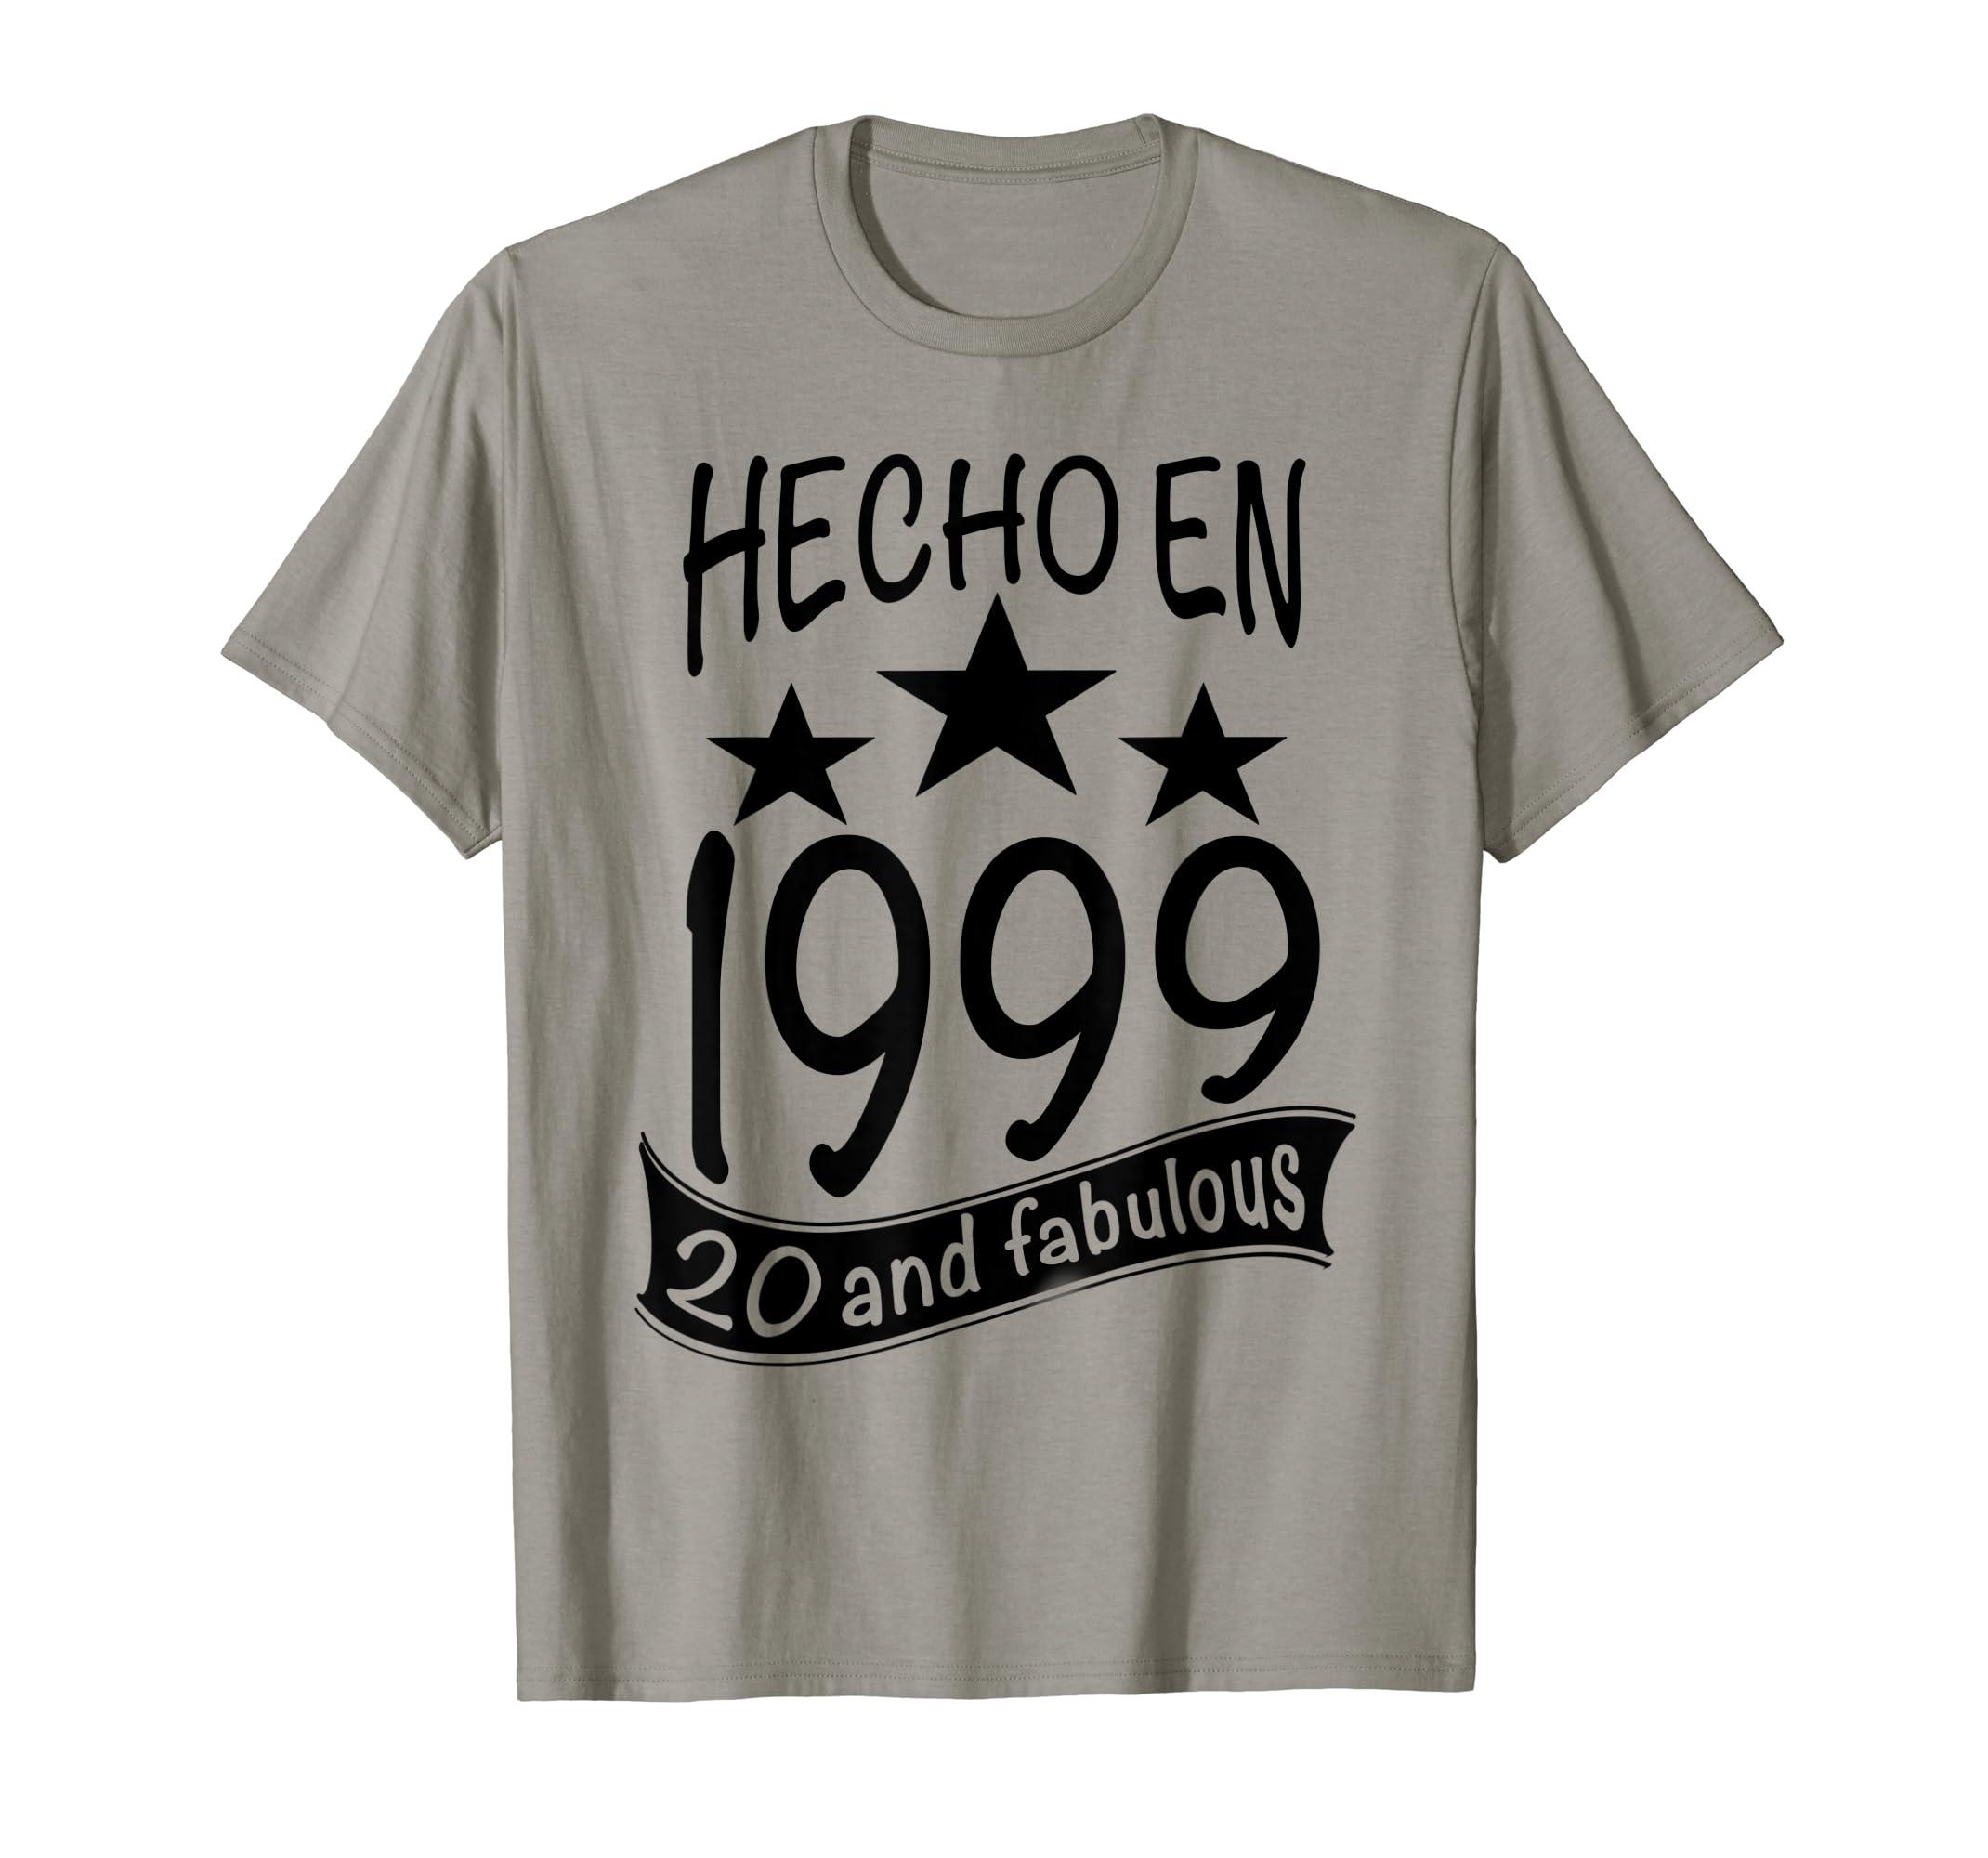 Amazon.com: Hecho en 1999 I 20 And Fabulous I Para Fiesta de ...